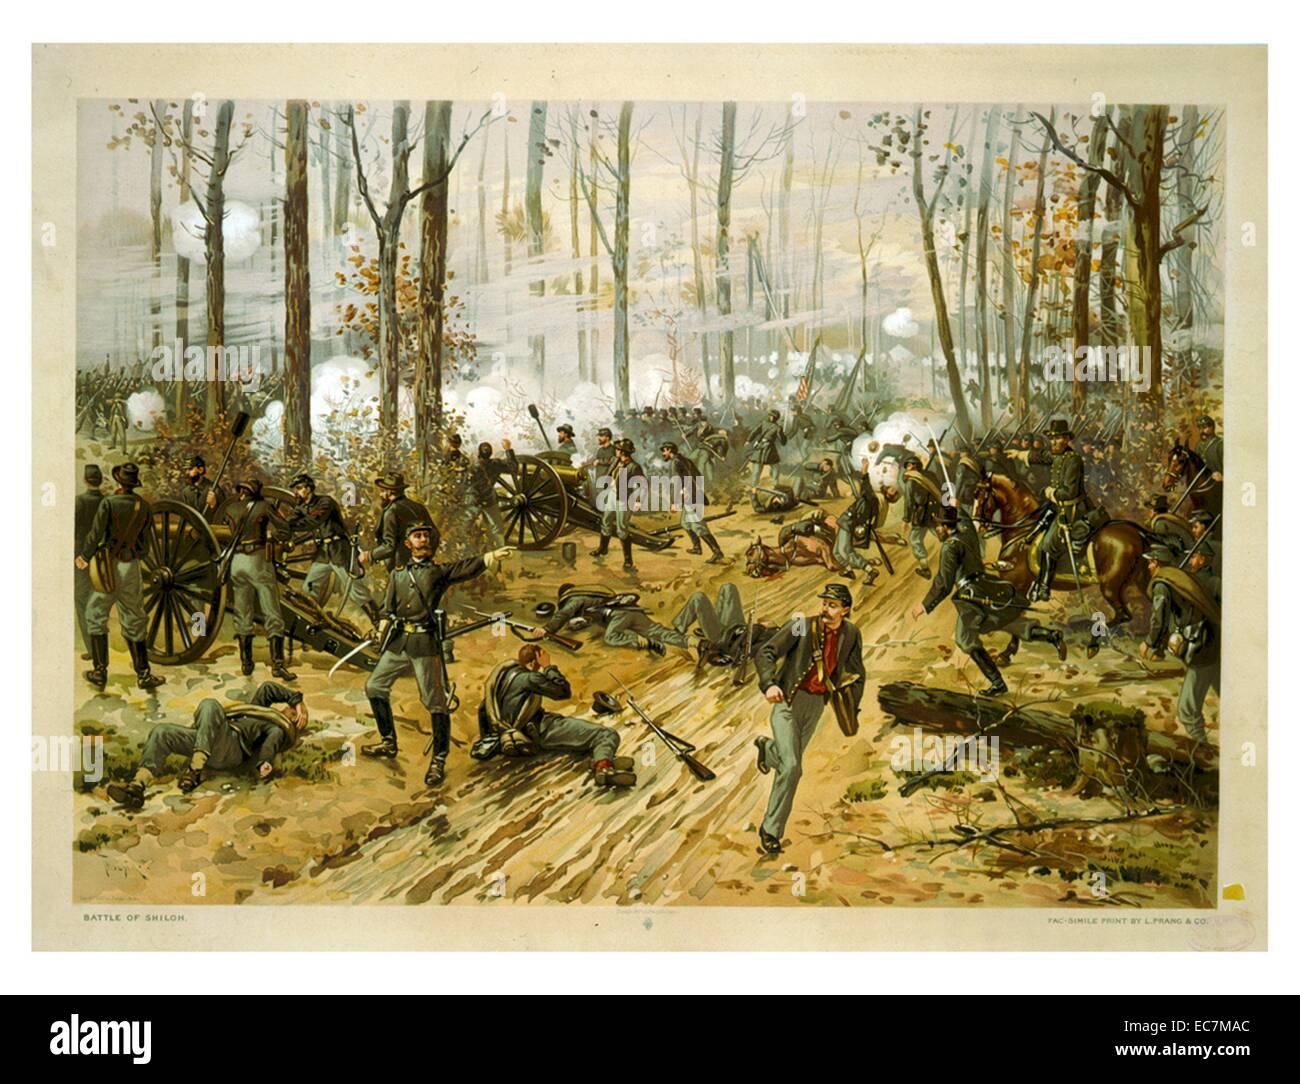 Battle of Shiloh by Thure de Thulstrup. The Battle of Shiloh, also known as the Battle of Pittsburgh Landing, was - Stock Image